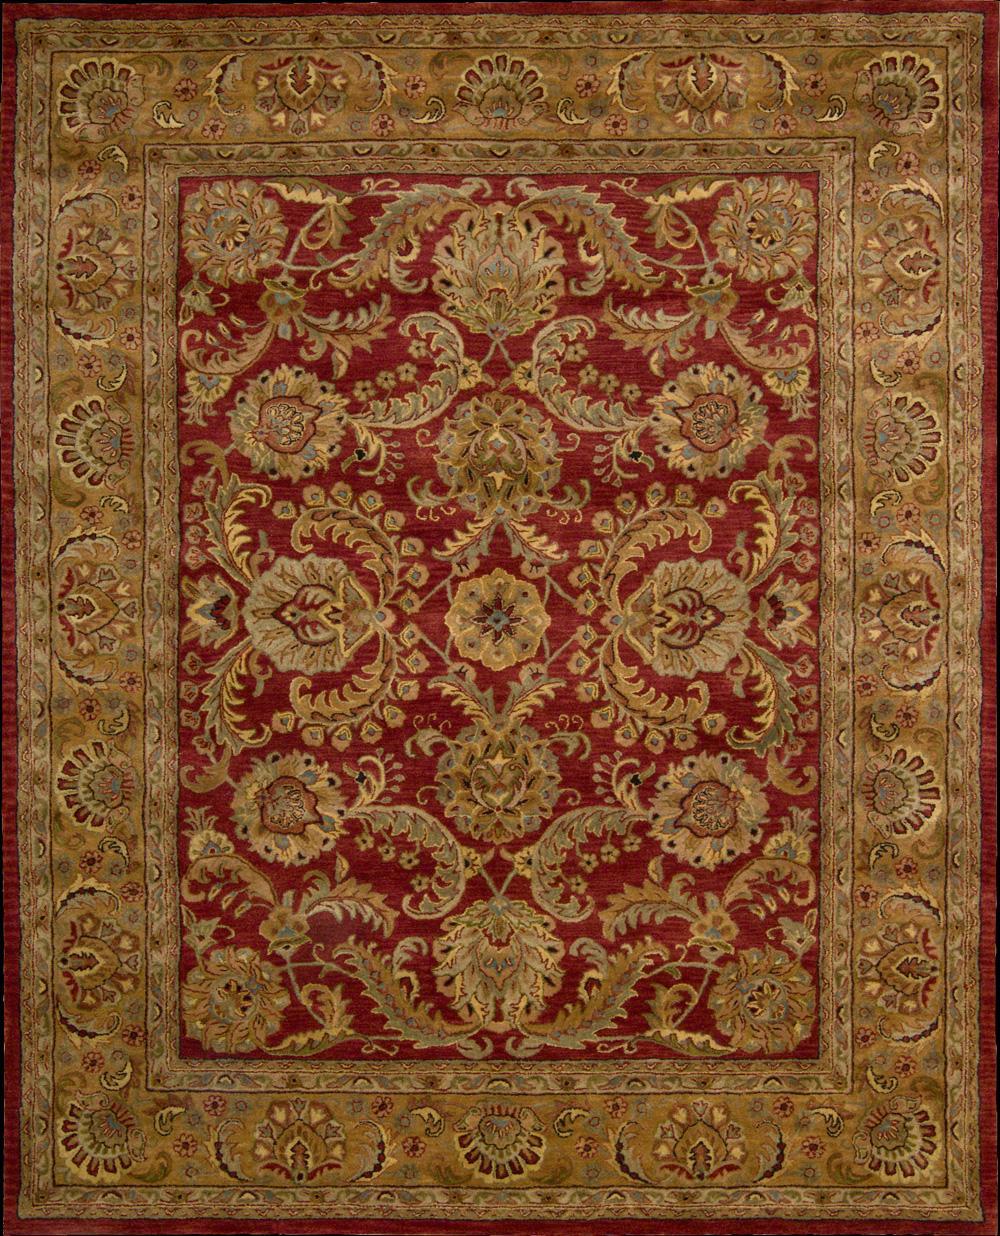 "Nourison Jaipur Area Rug 5'6"" x 8'6"" - Item Number: 49821"